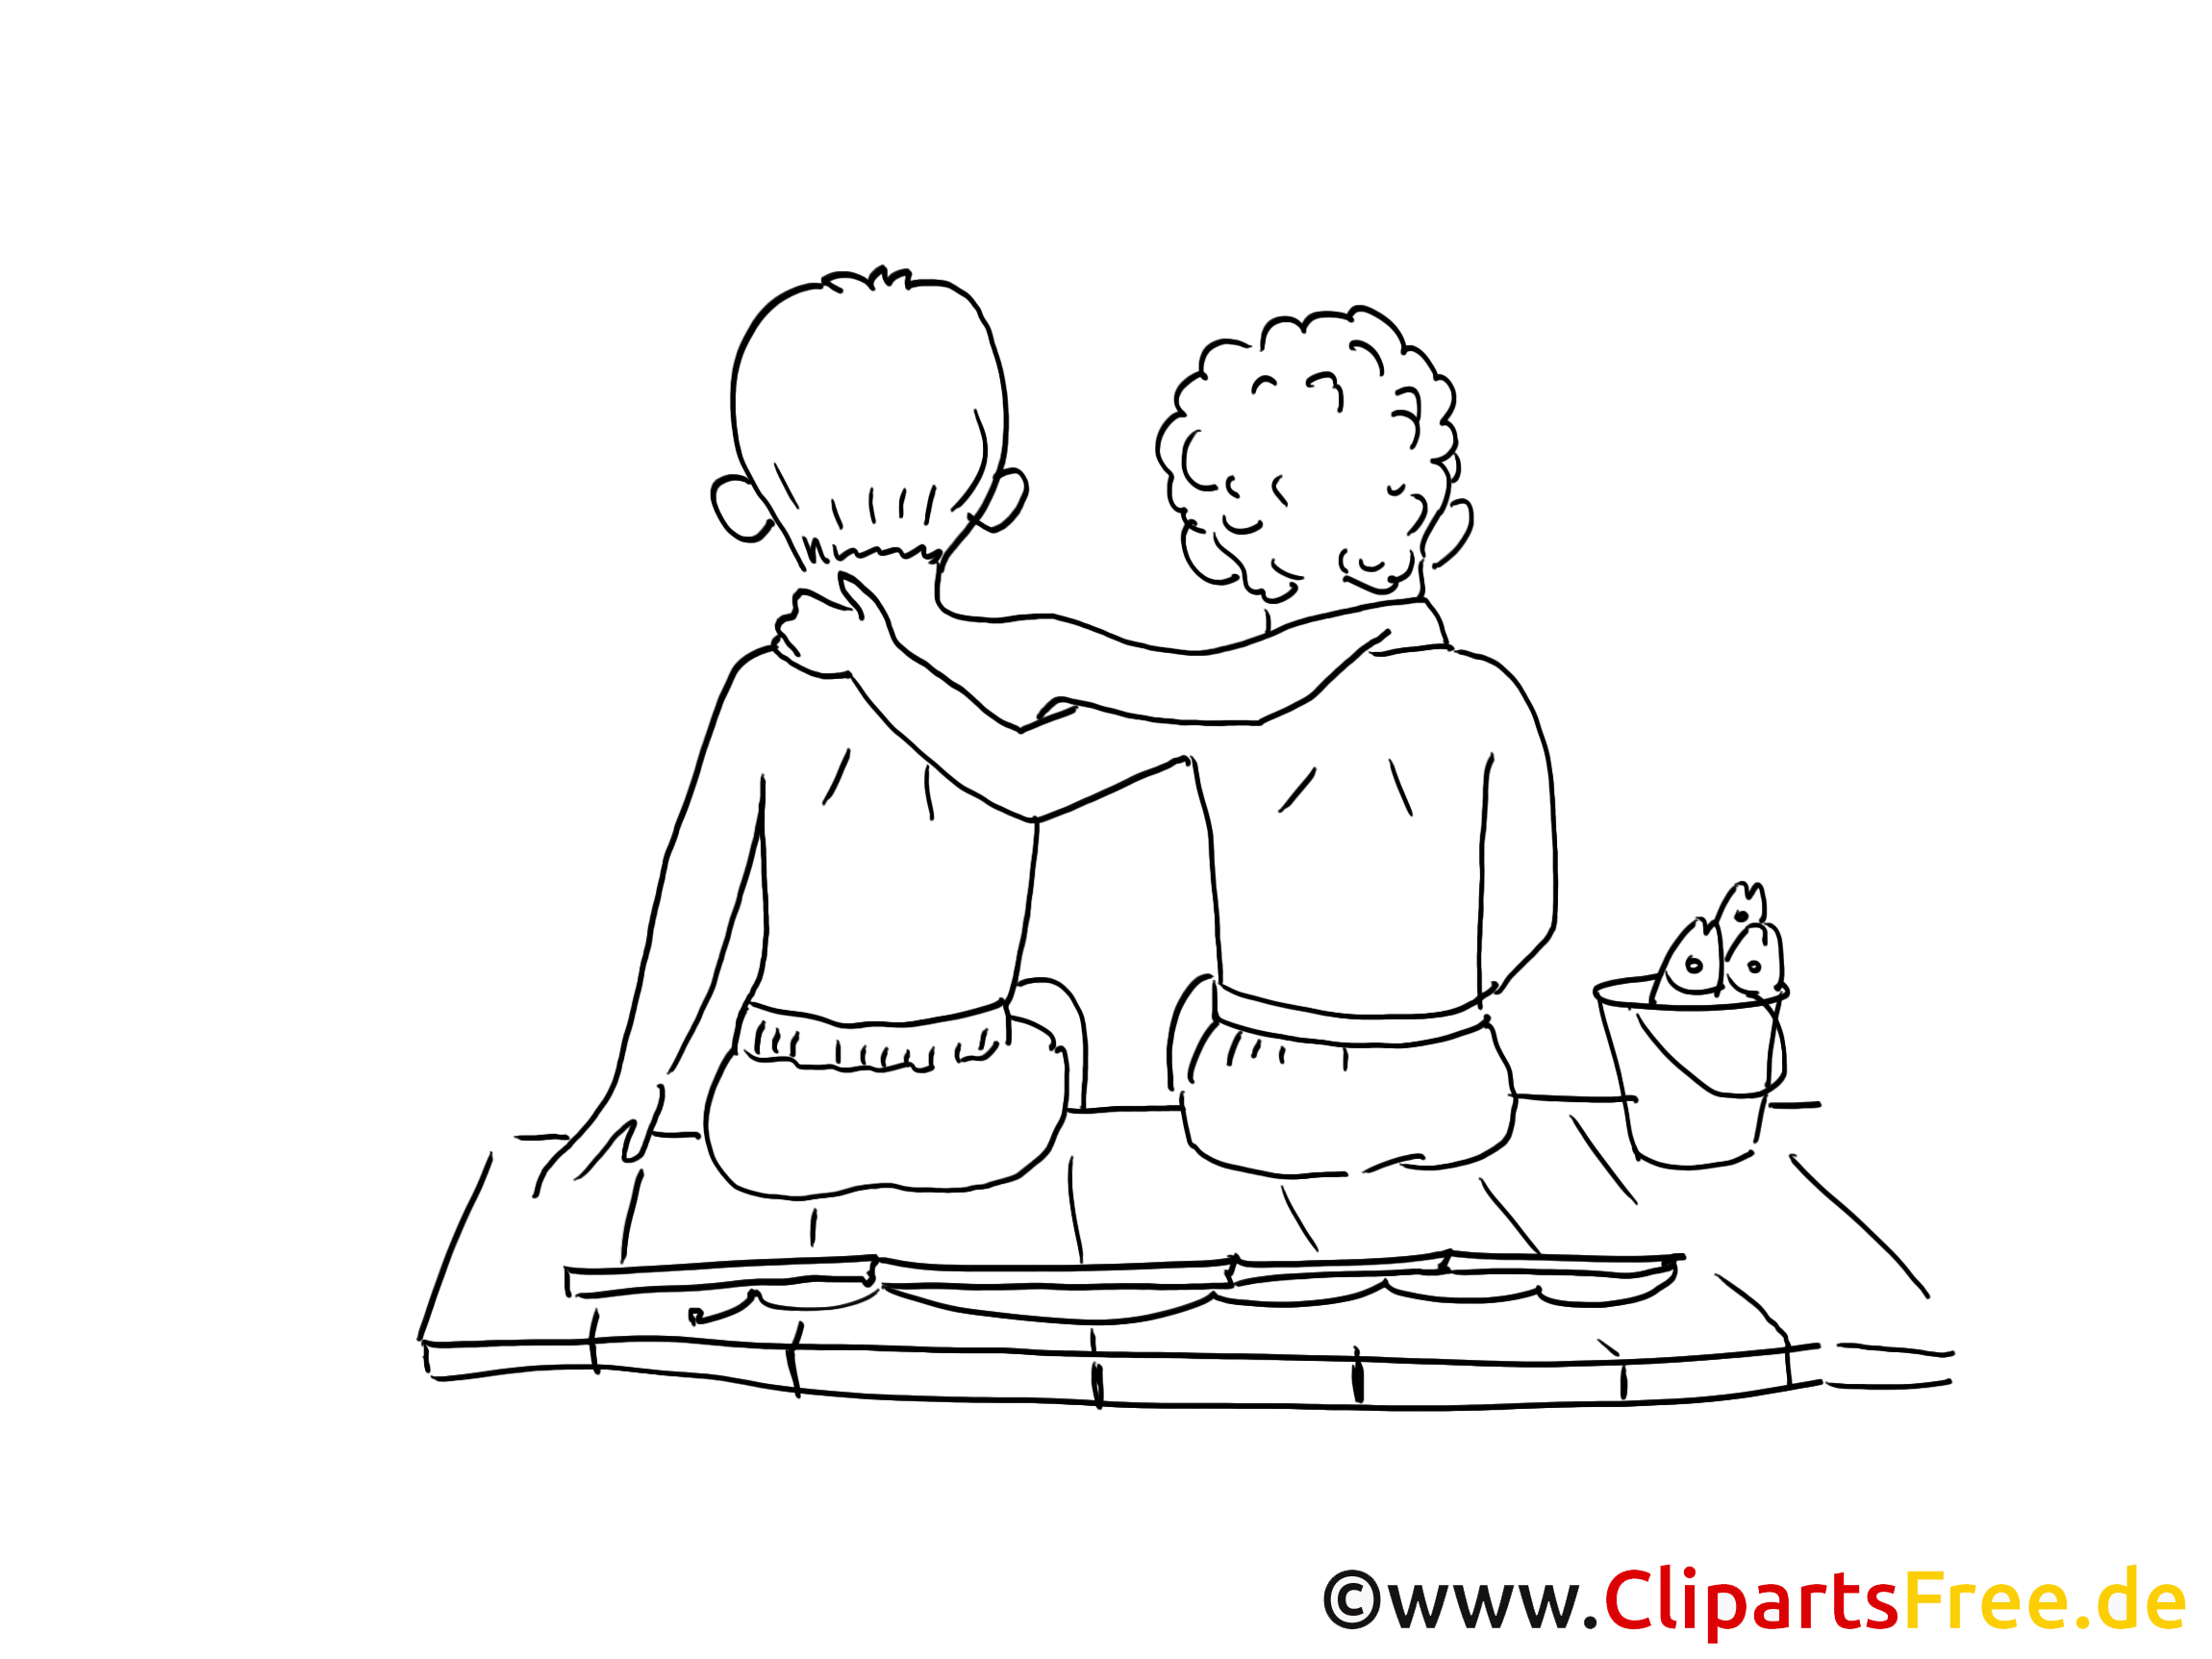 Çizim çocuk, küçük resim, resim siyah beyaz, çizgi film, bedava çizgi film